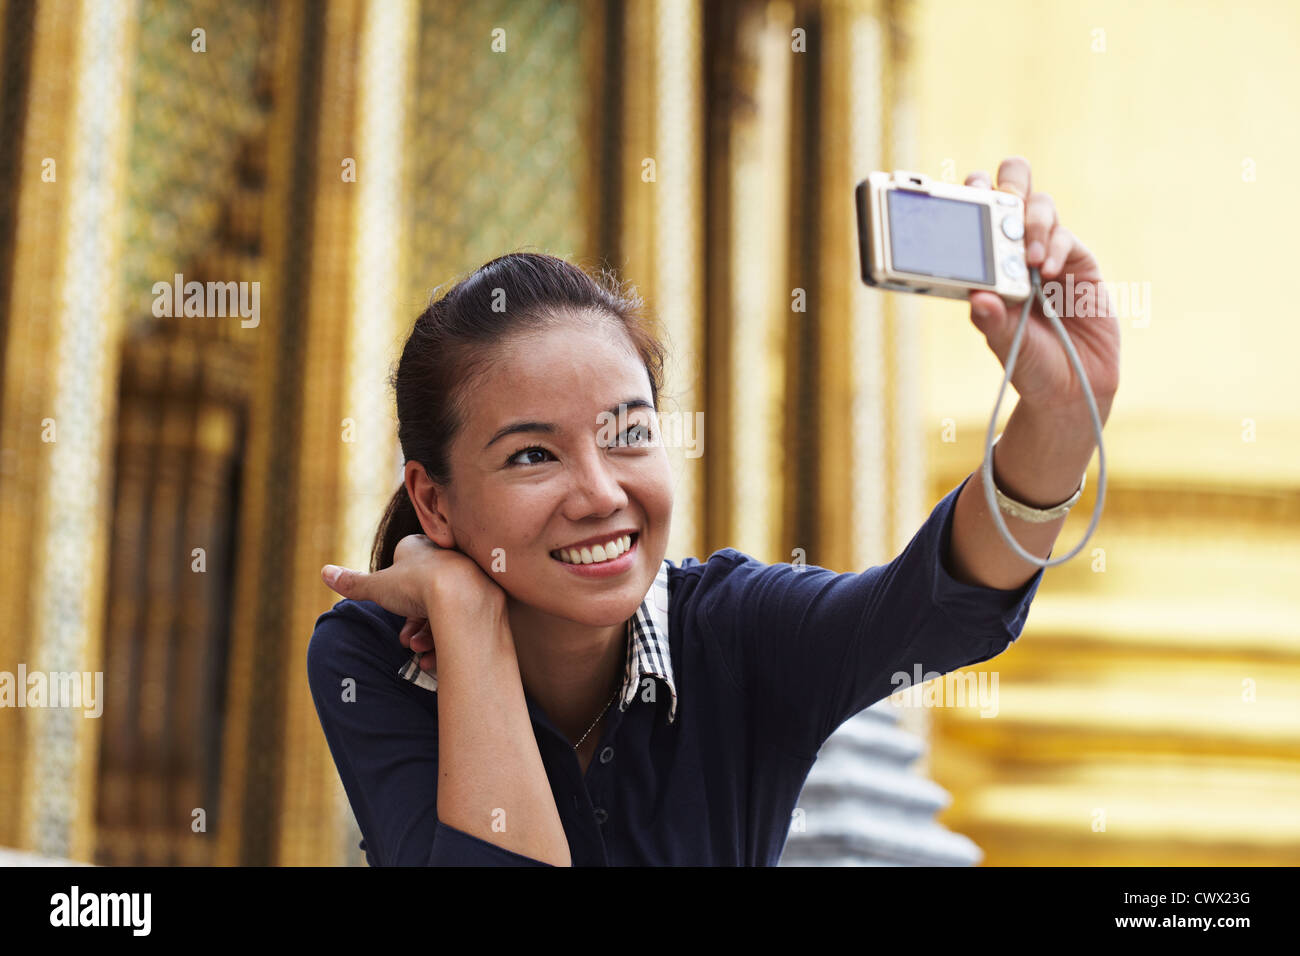 Frau Aufnahmen bei kunstvolle Tempel Stockbild